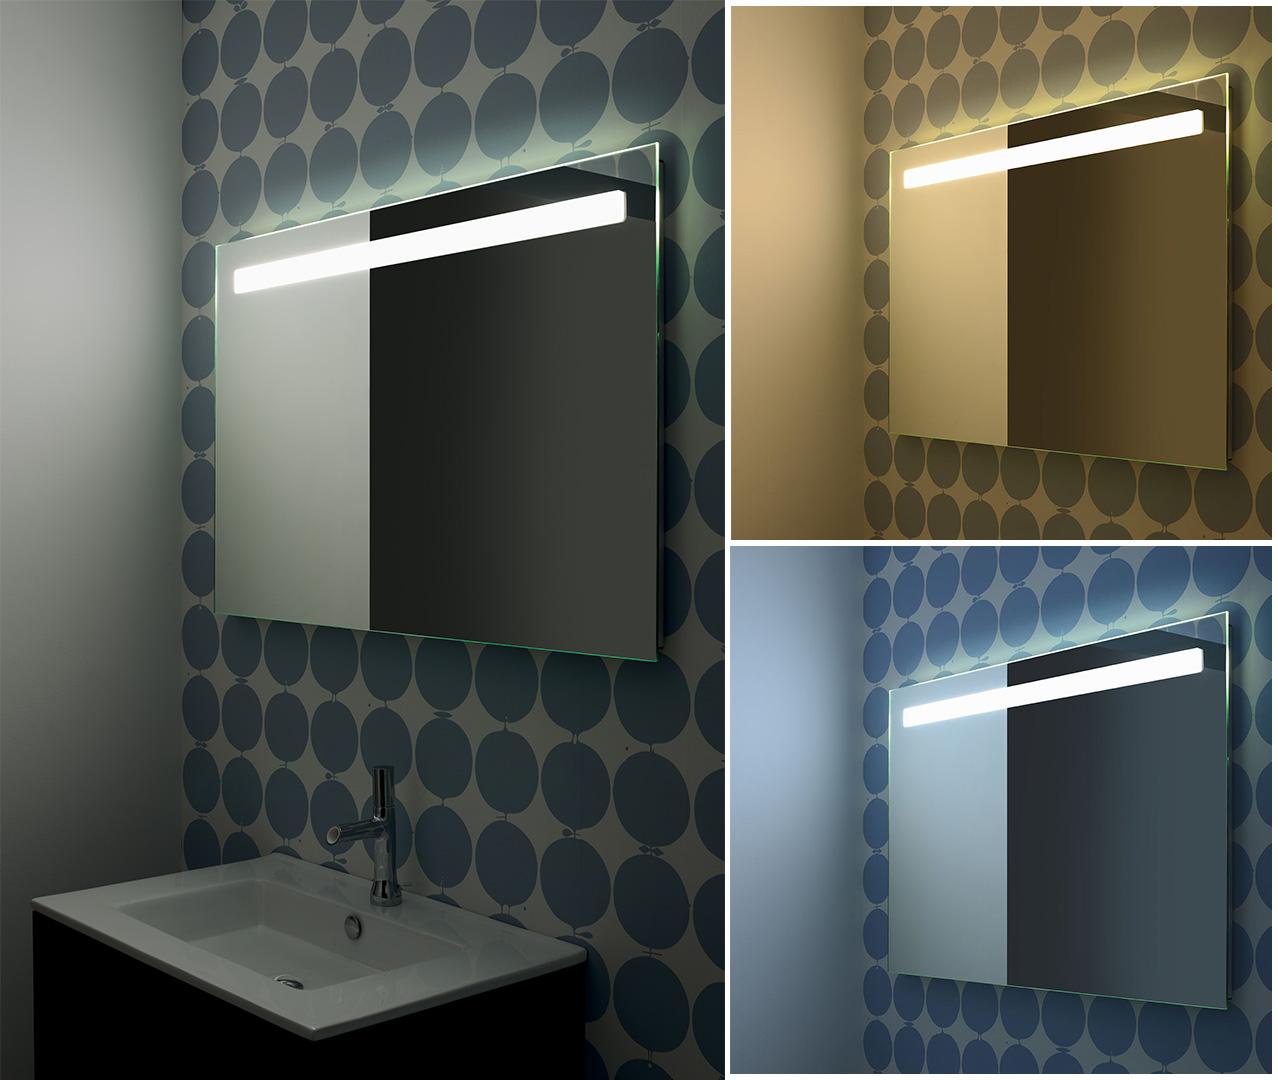 miroirs reflet - Sanijura